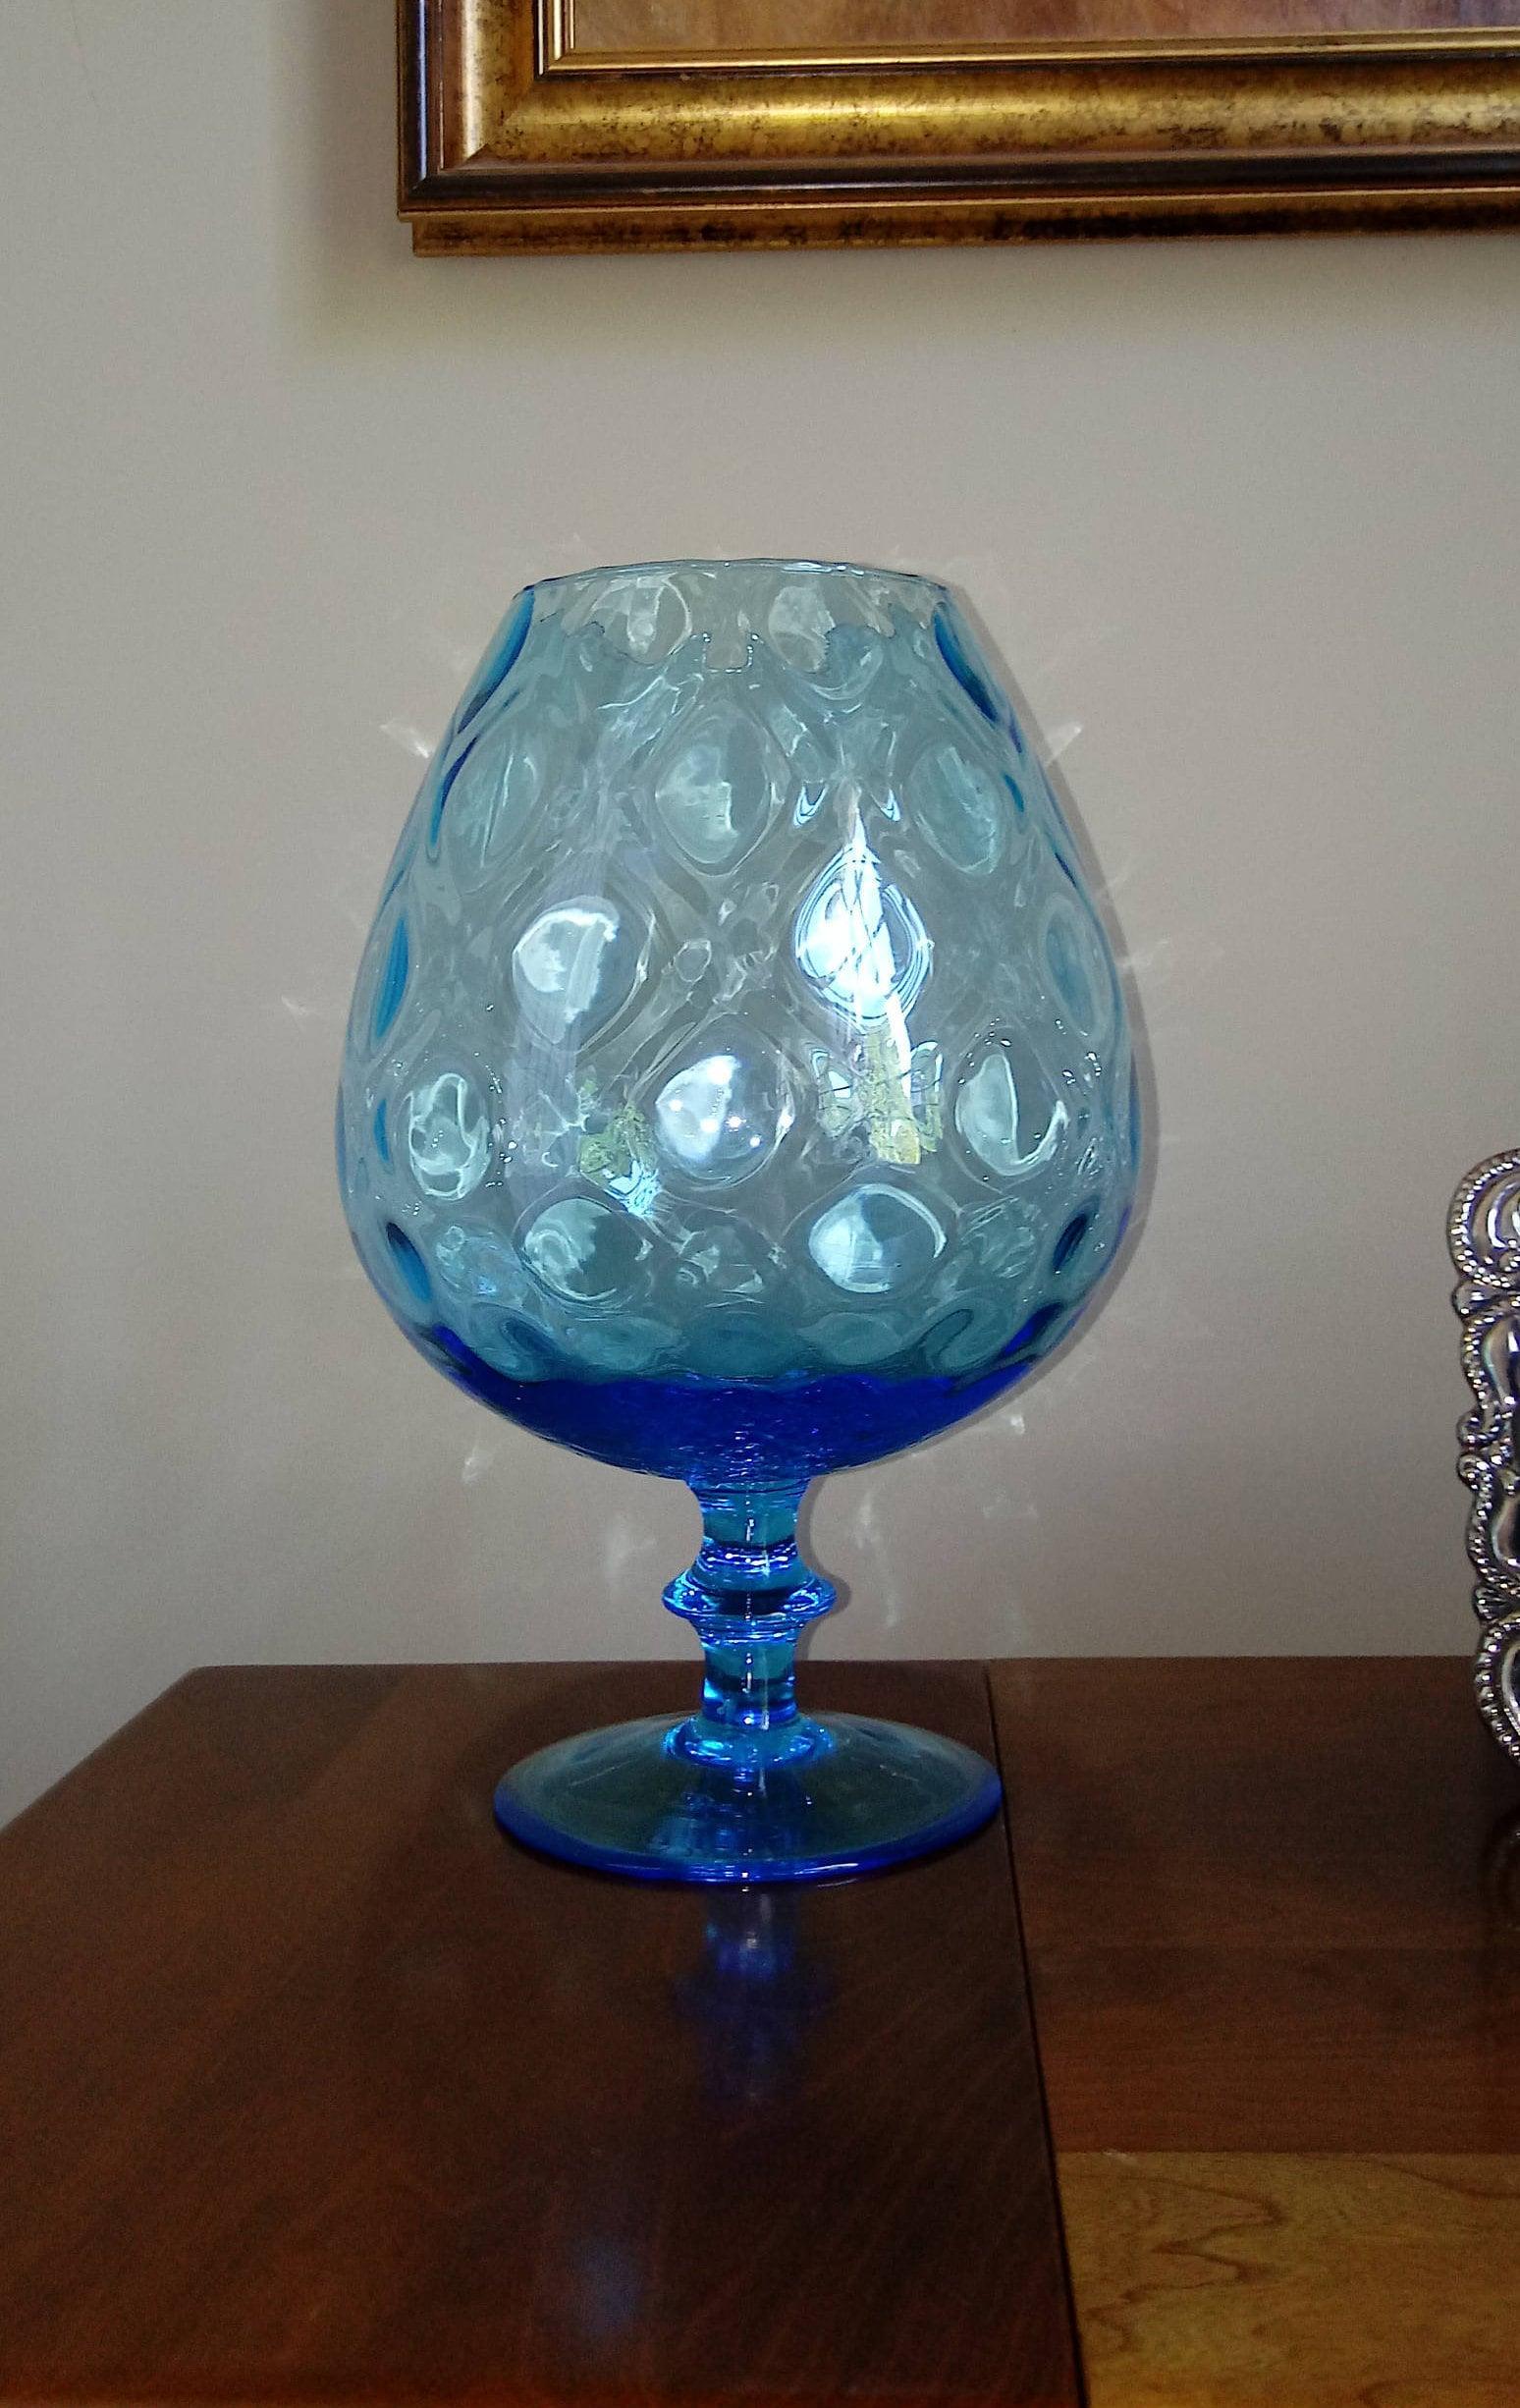 Vintage large blue glass brandy snifter aqua blue vase seaside gallery photo gallery photo gallery photo gallery photo gallery photo reviewsmspy